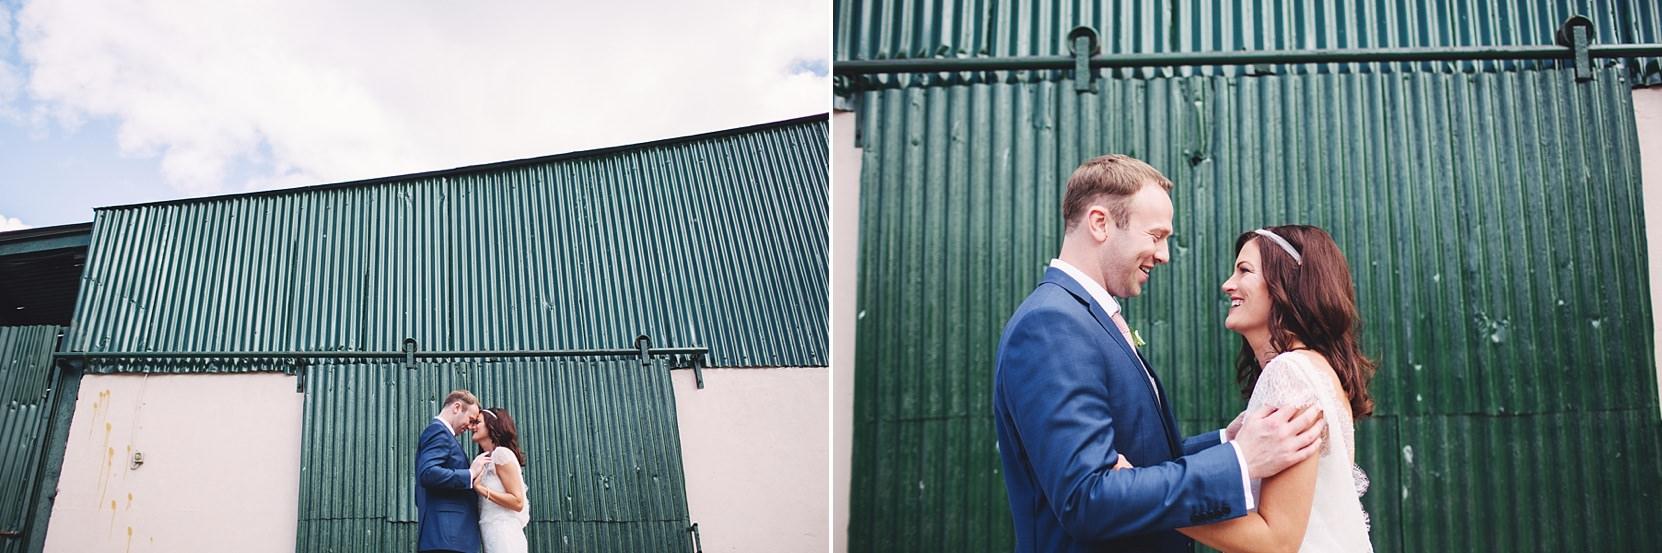 Cloughjordan-Wedding-Photography_0119